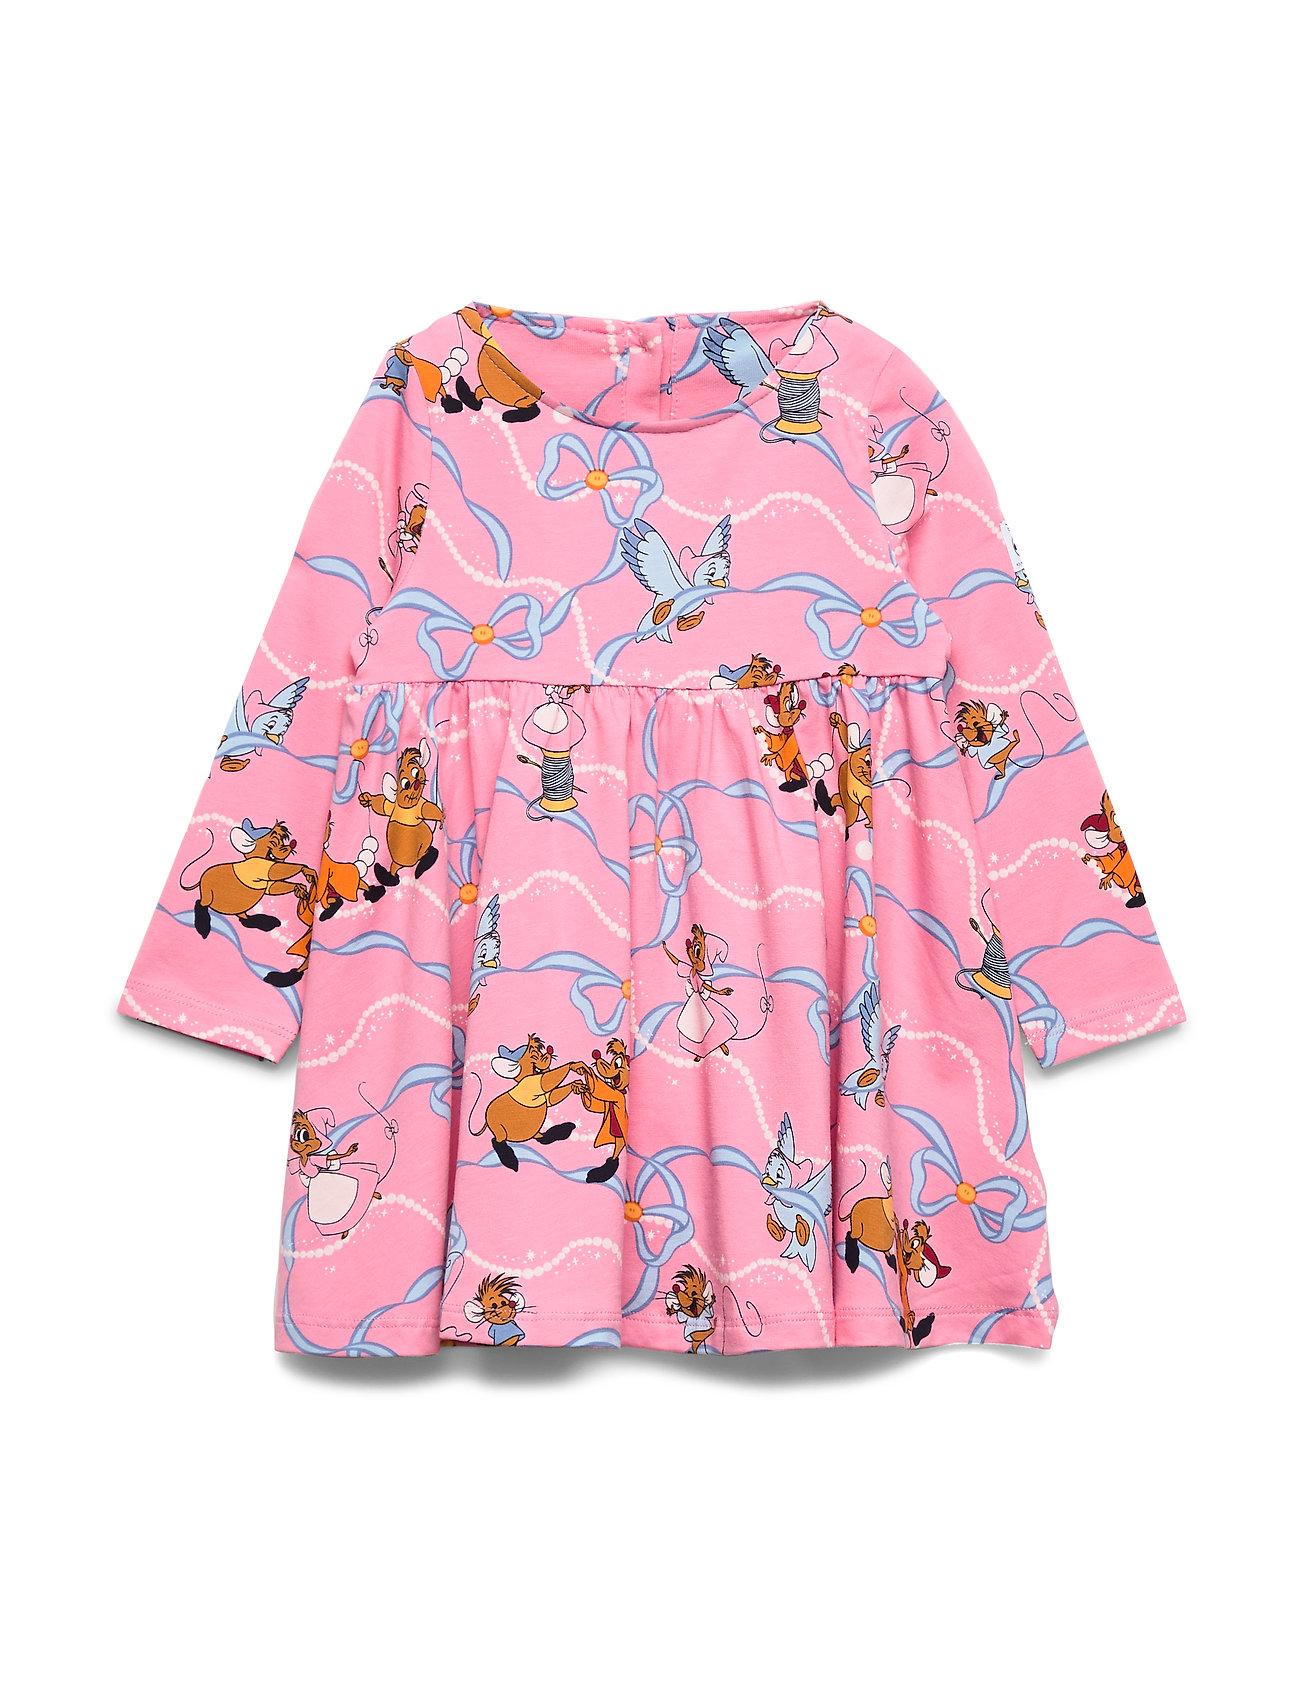 Polarn O. Pyret Disney Collection Dress l/s AOP Preschool - MORNING GLORY